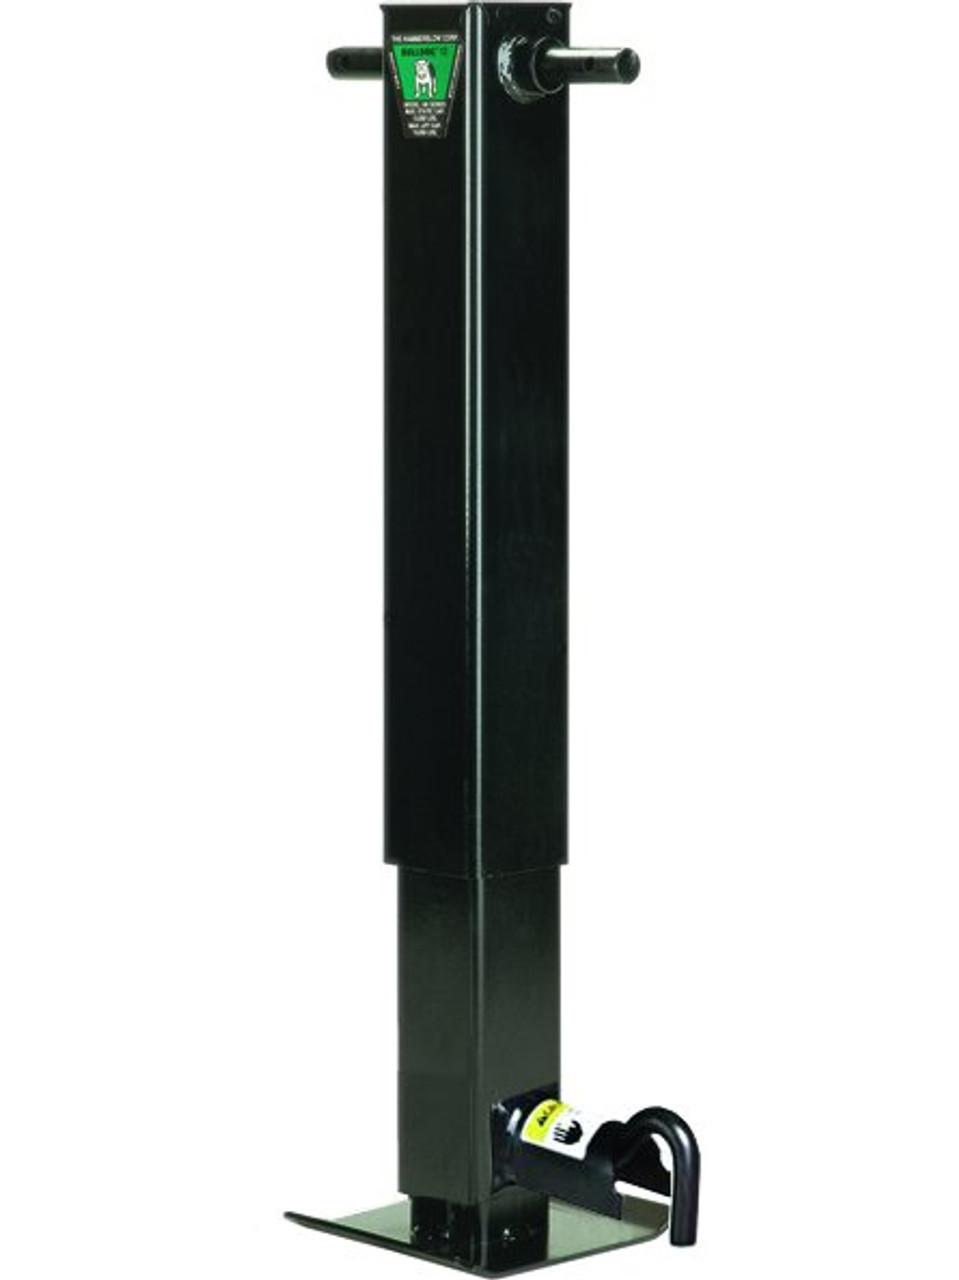 182805 --- BULLDOG Companion Jack for Two Speed Drop Leg Trailer Jack - Pin to Side - 10,000 lb